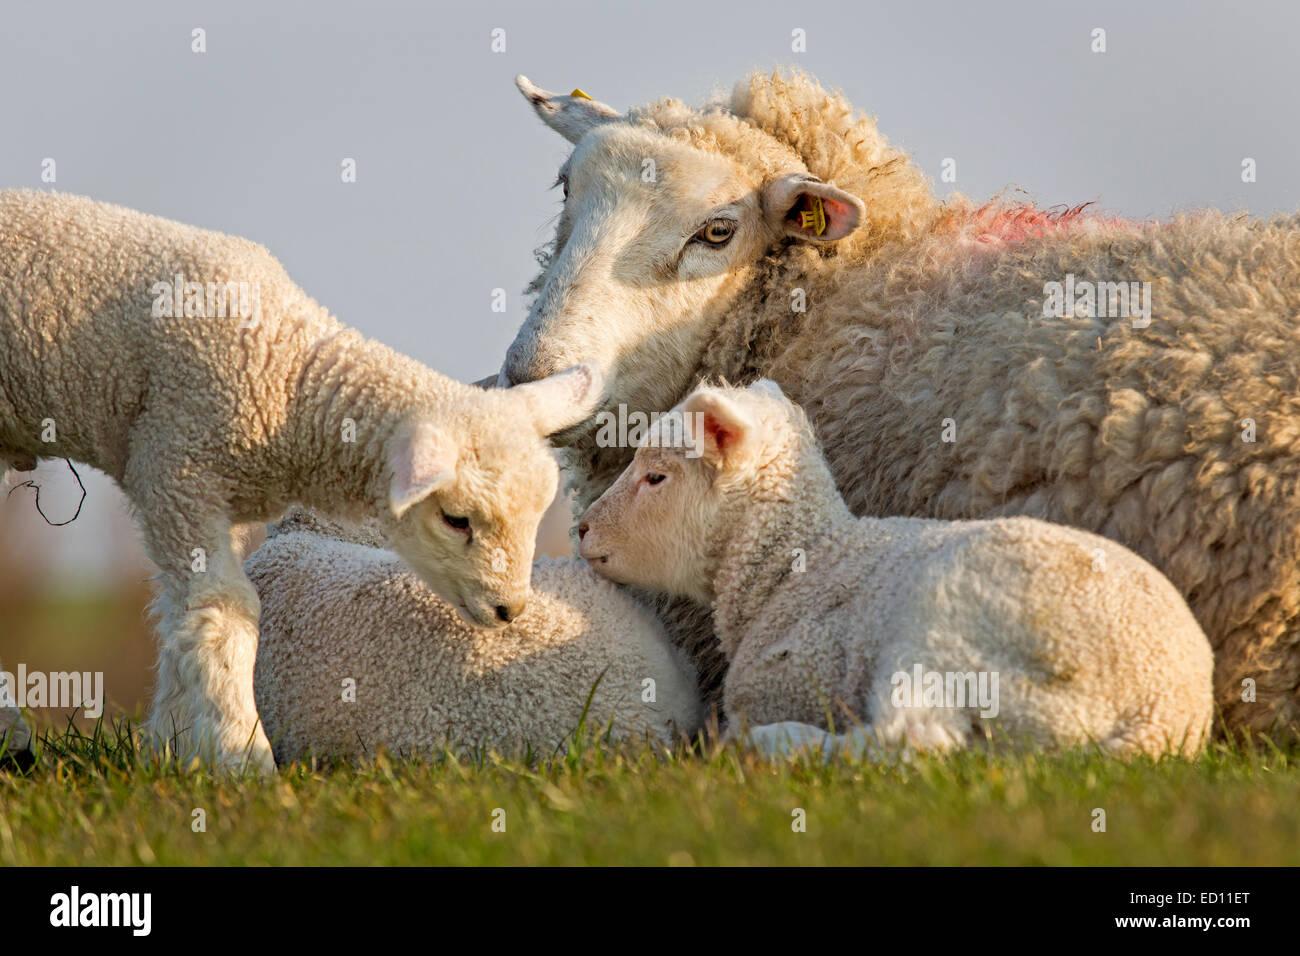 Ovejas con animales jóvenes, Frisia septentrional, Schleswig-Holstein, Alemania, Europa Imagen De Stock